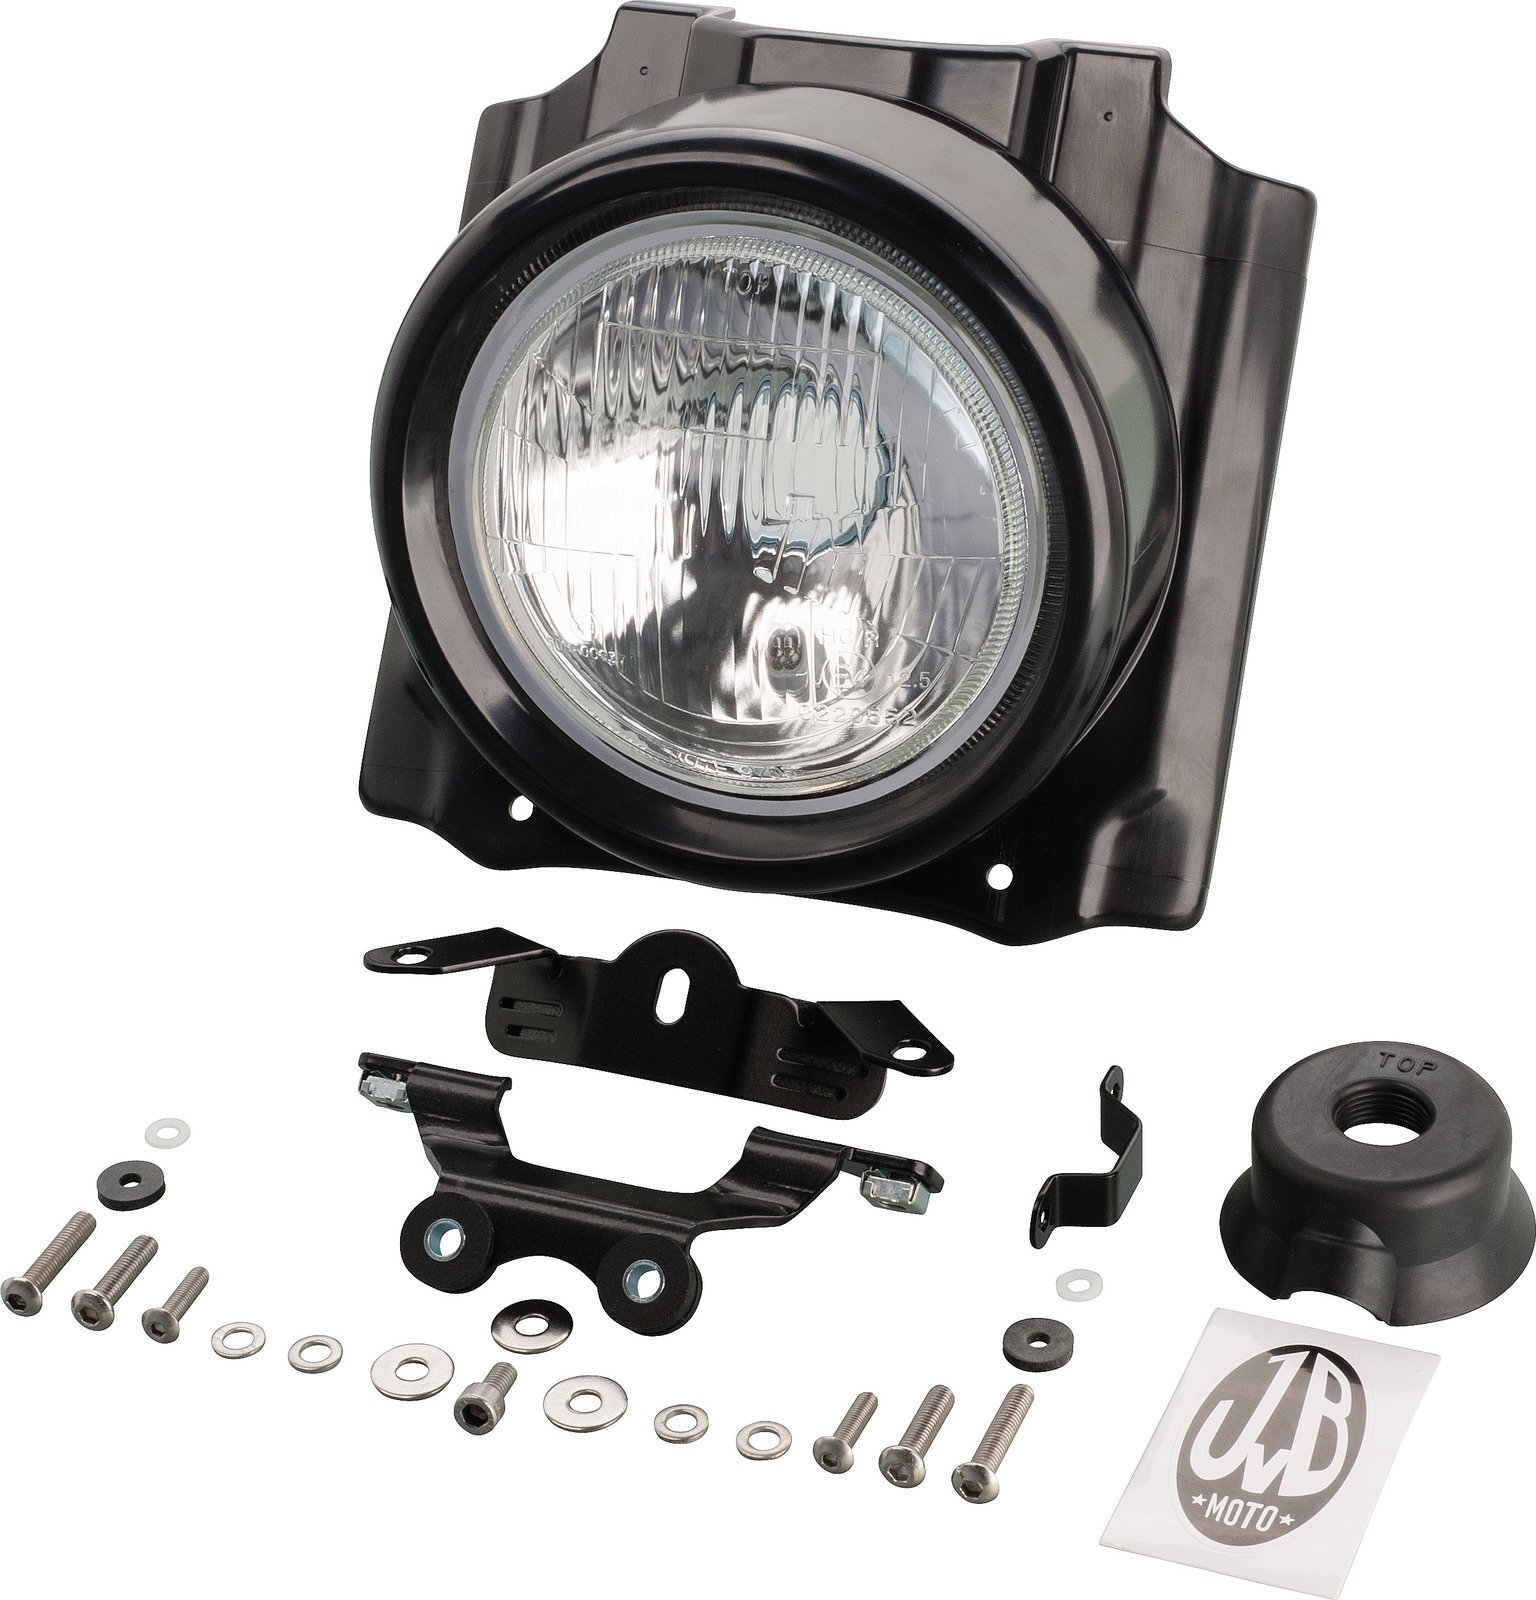 JvB-moto ' ABS Headlight Cover H4 lamp JVB0058-1